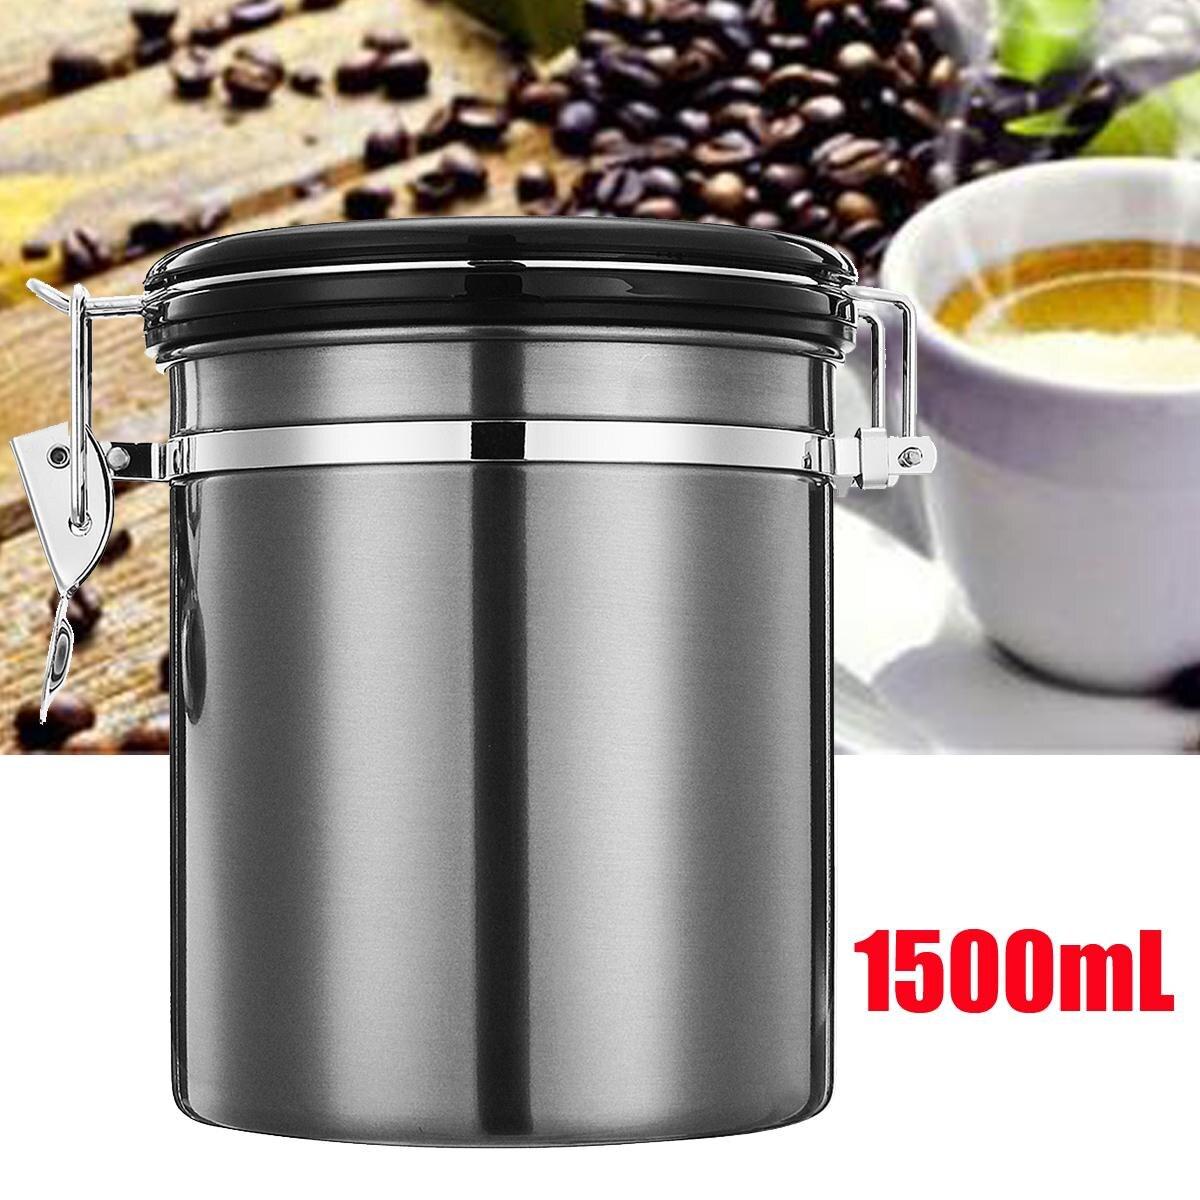 1.5L Coffee Beans Candy Sugar Tea Jar Storage Sealed Container Lid w/Valve Pot 680ml glass storage jar purple